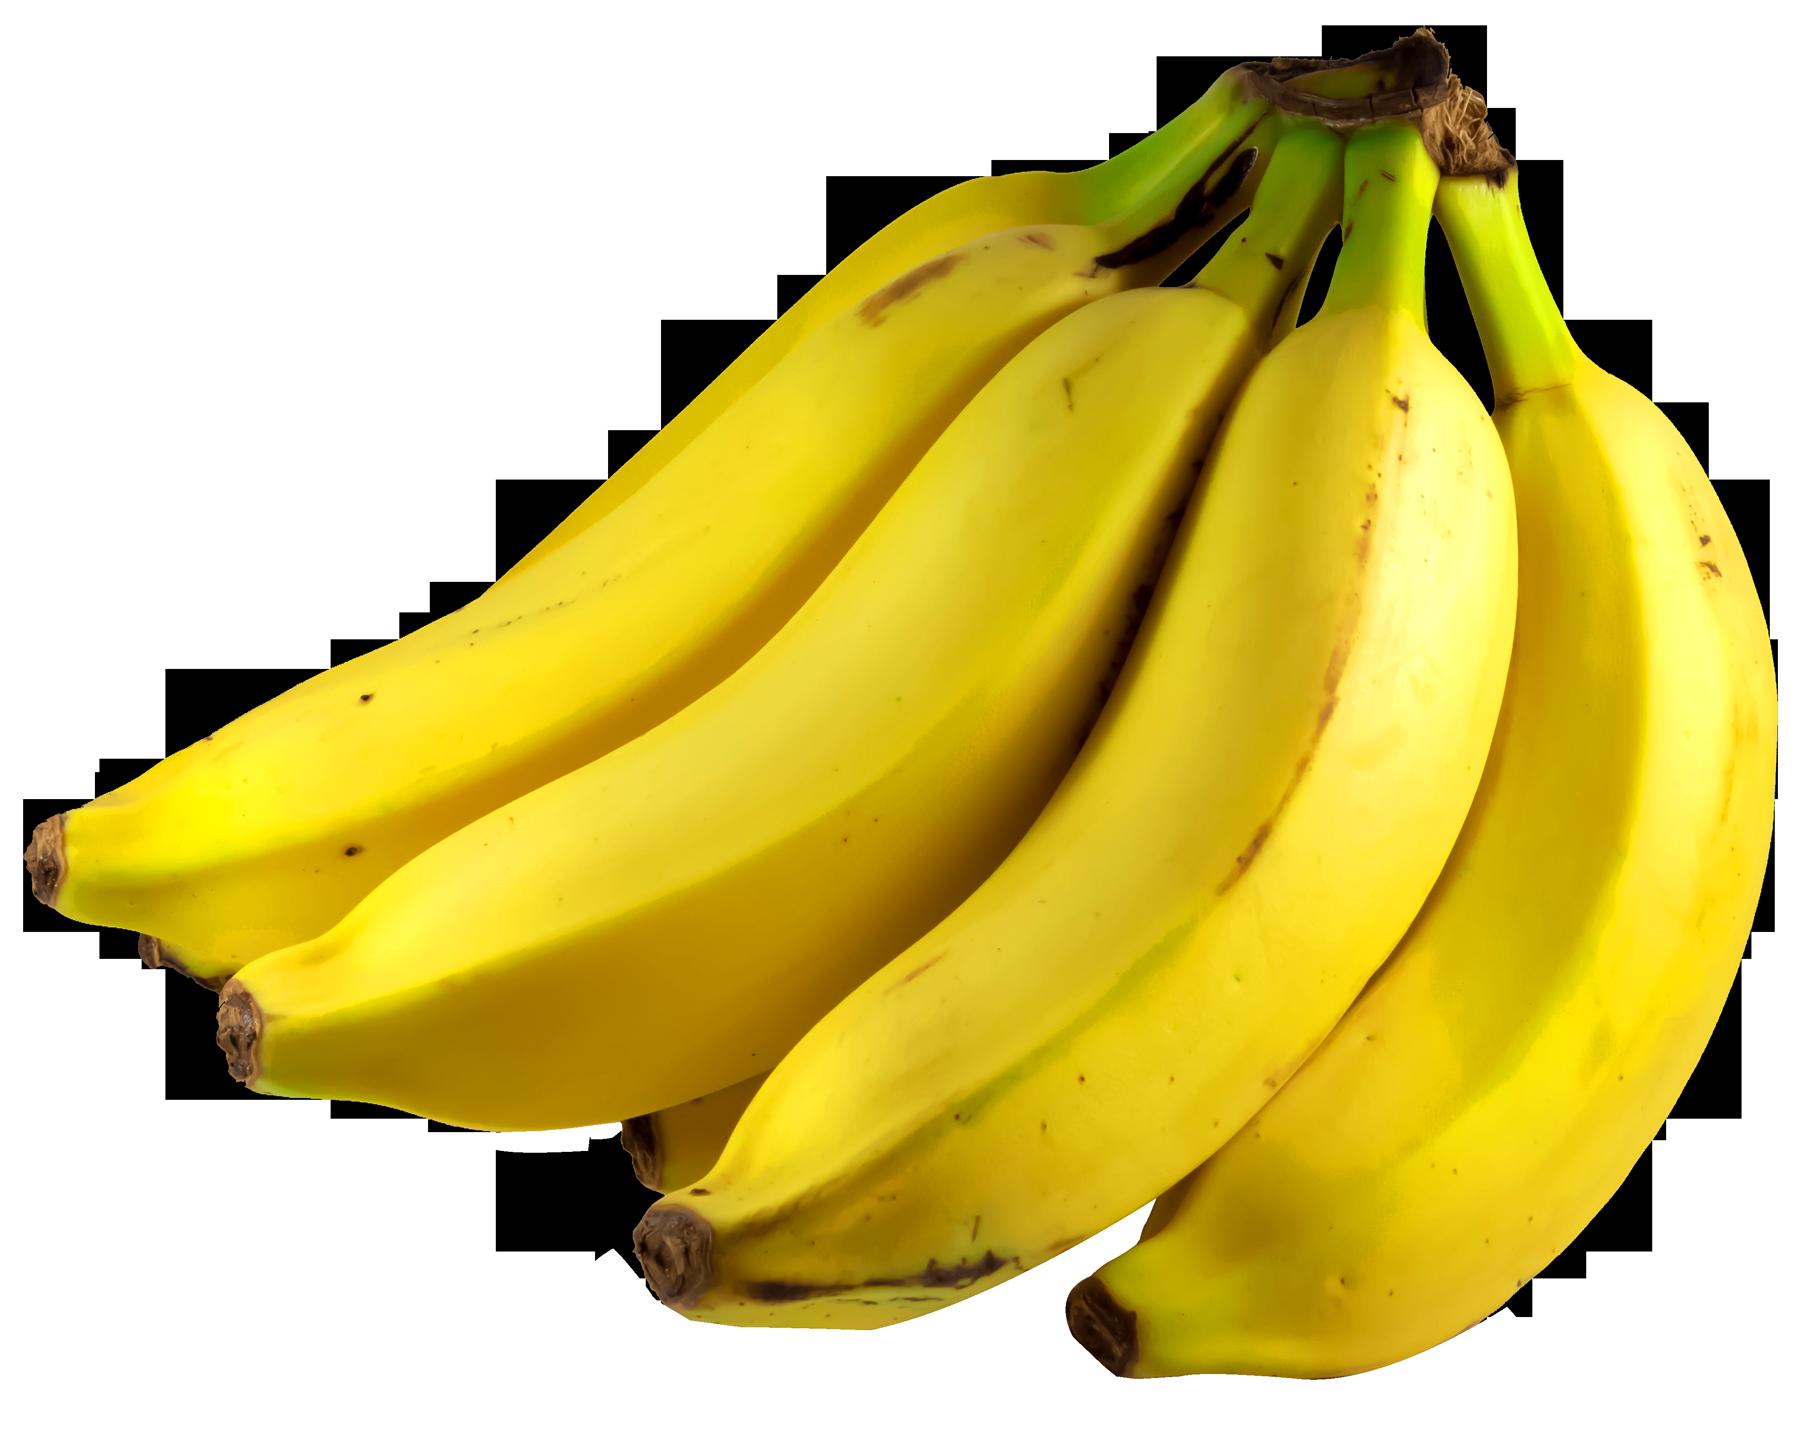 Banana PNG Image - PurePNG   Free transparent CC0 PNG ...